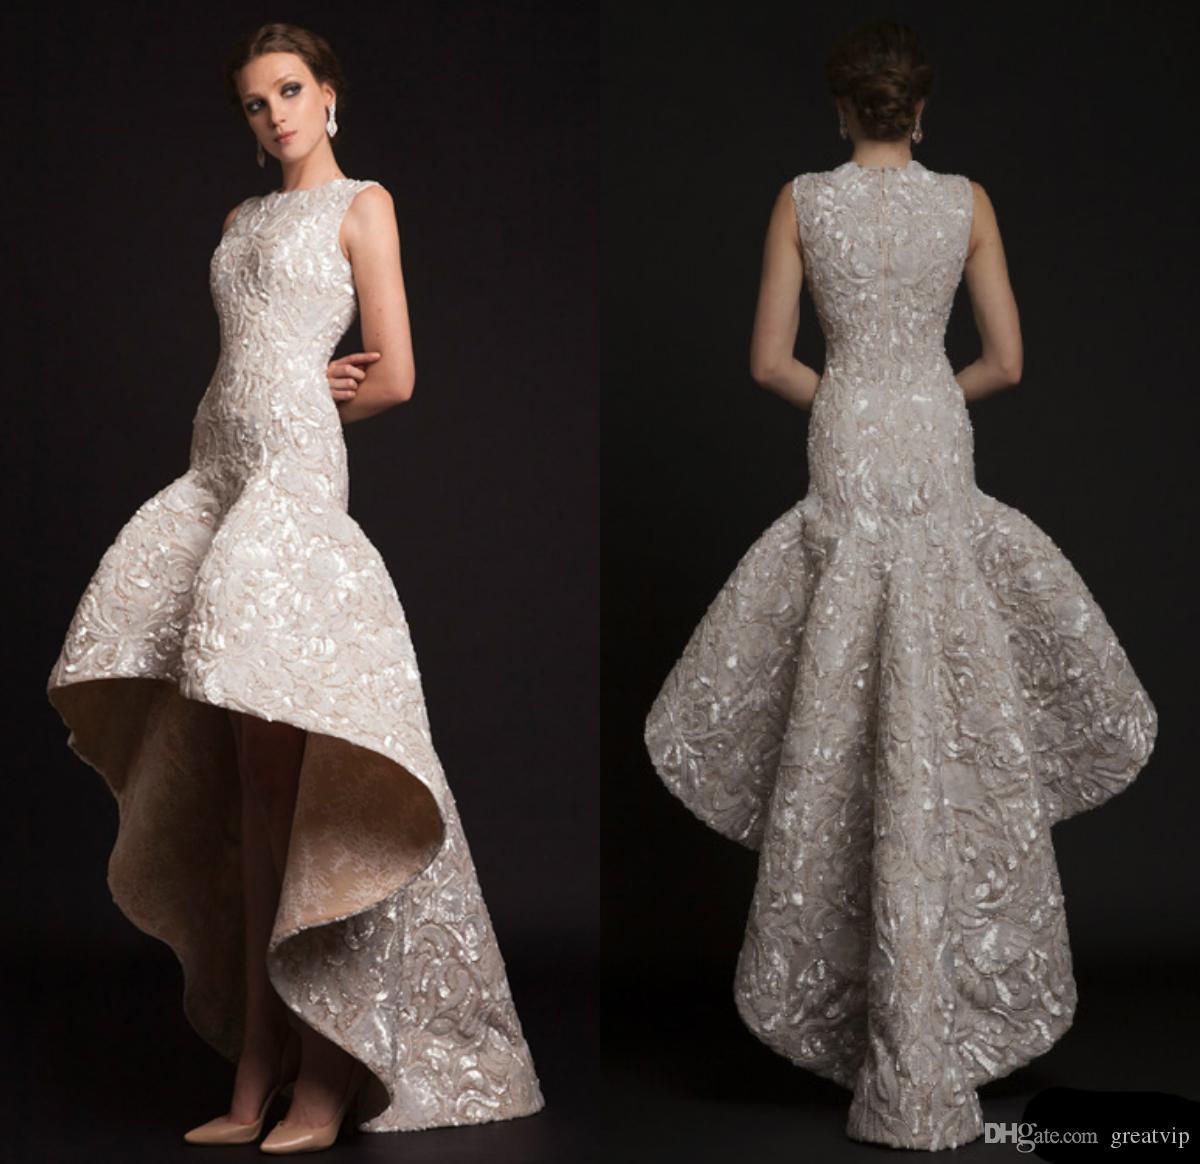 2019 Krikor Jabotian 럭셔리 이브닝 드레스 보석 높은 낮은 인어 공주 민소매 공식 파티 드레스 Abendkleider 파티 드레스